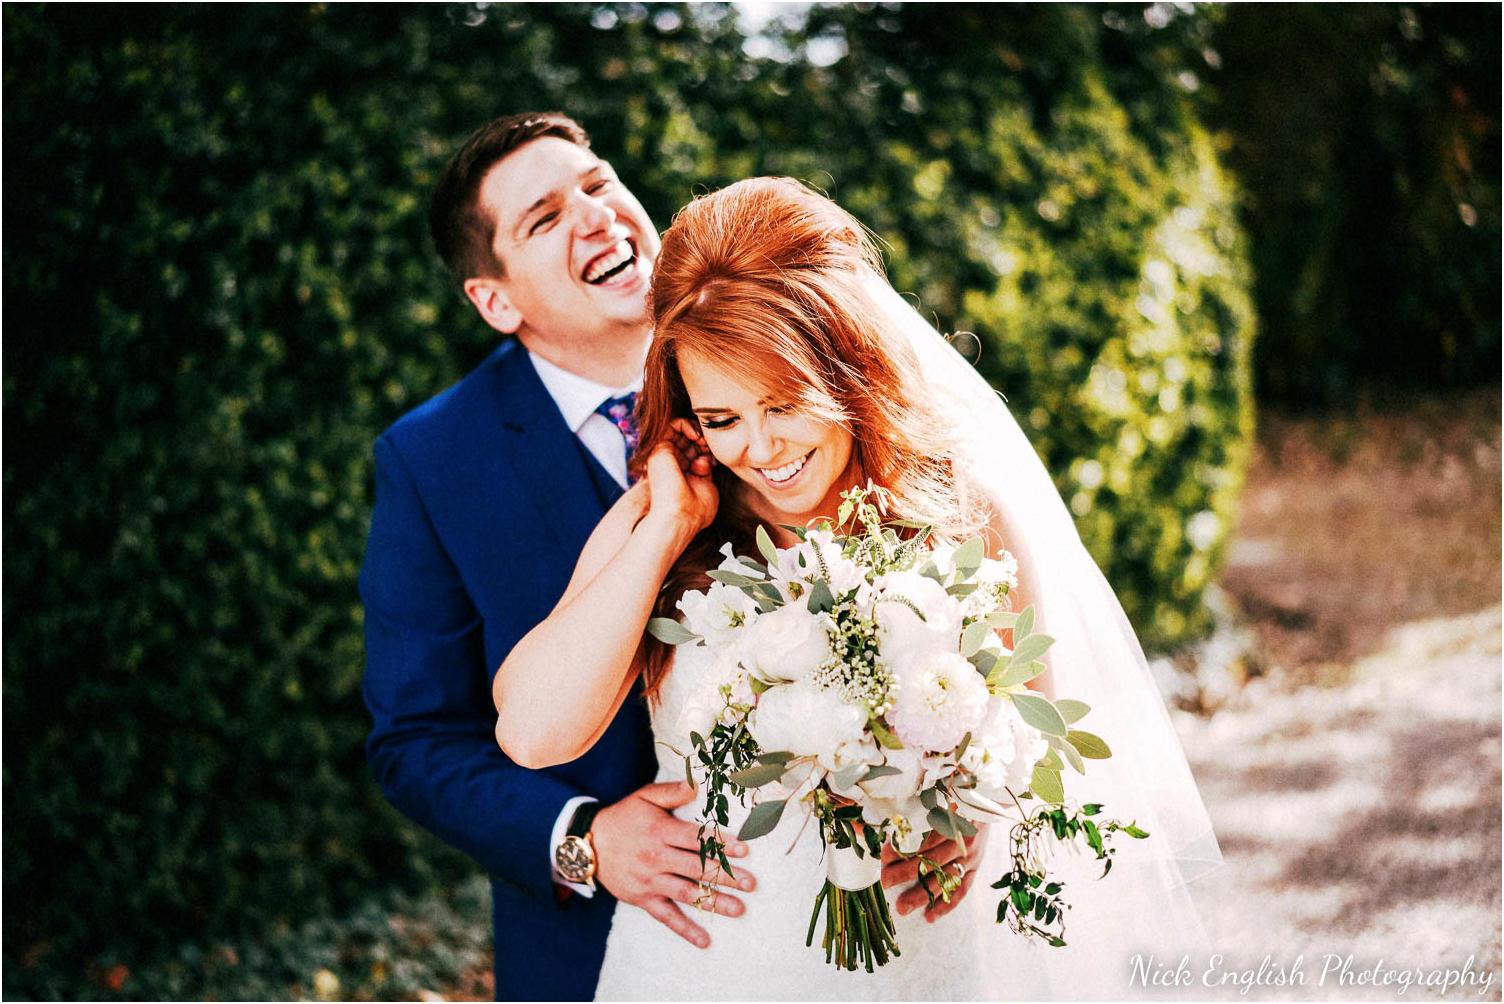 Mitton_Hall_Wedding_Photographer-128.jpg